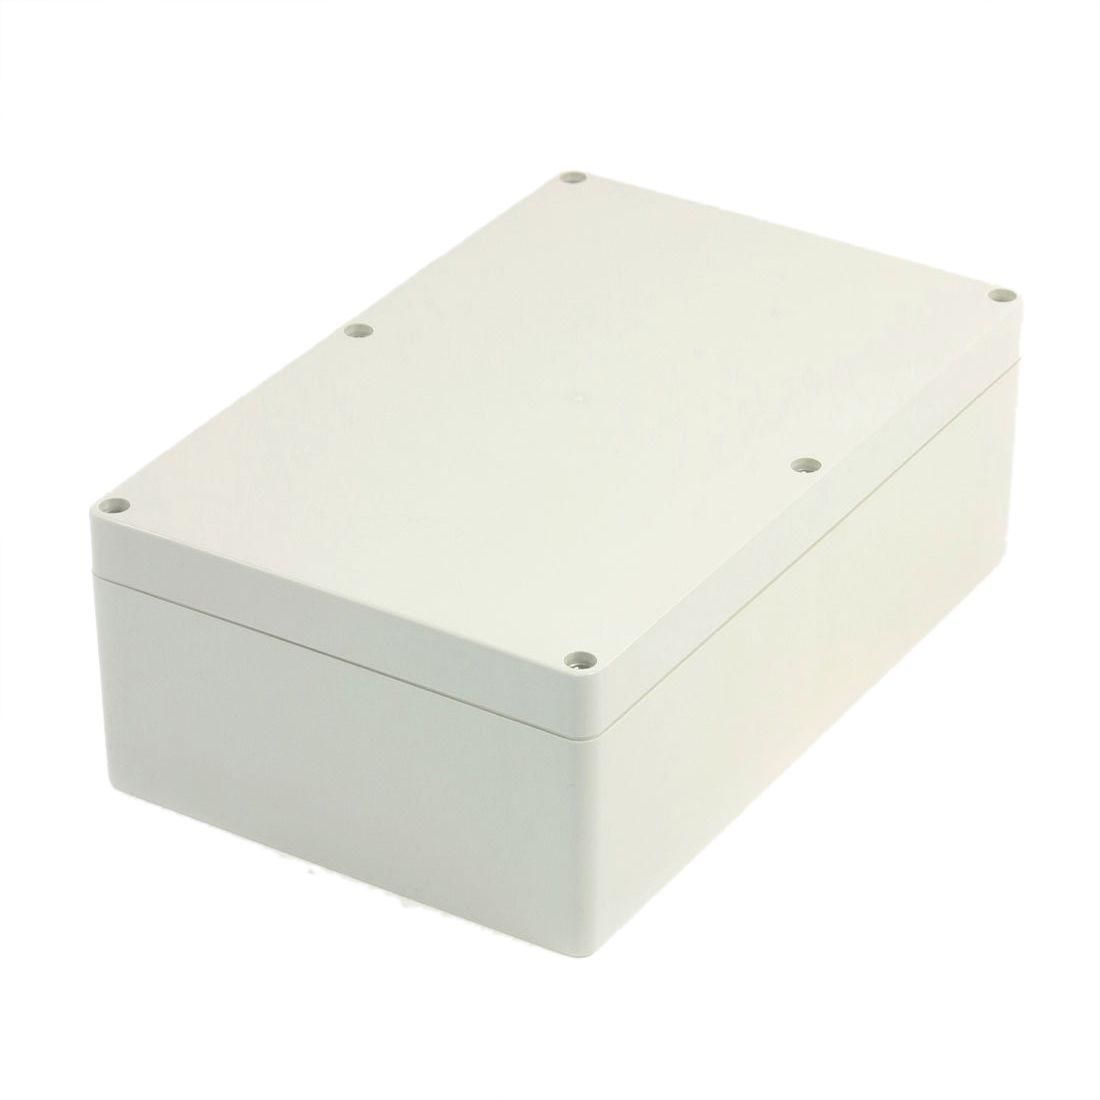 230mmx150mmx85mm Waterproof Plastic Enclosure Case Power Junction Box High Qualit Electronics Projects Diy Waterproofing Plastic Electronics Projects